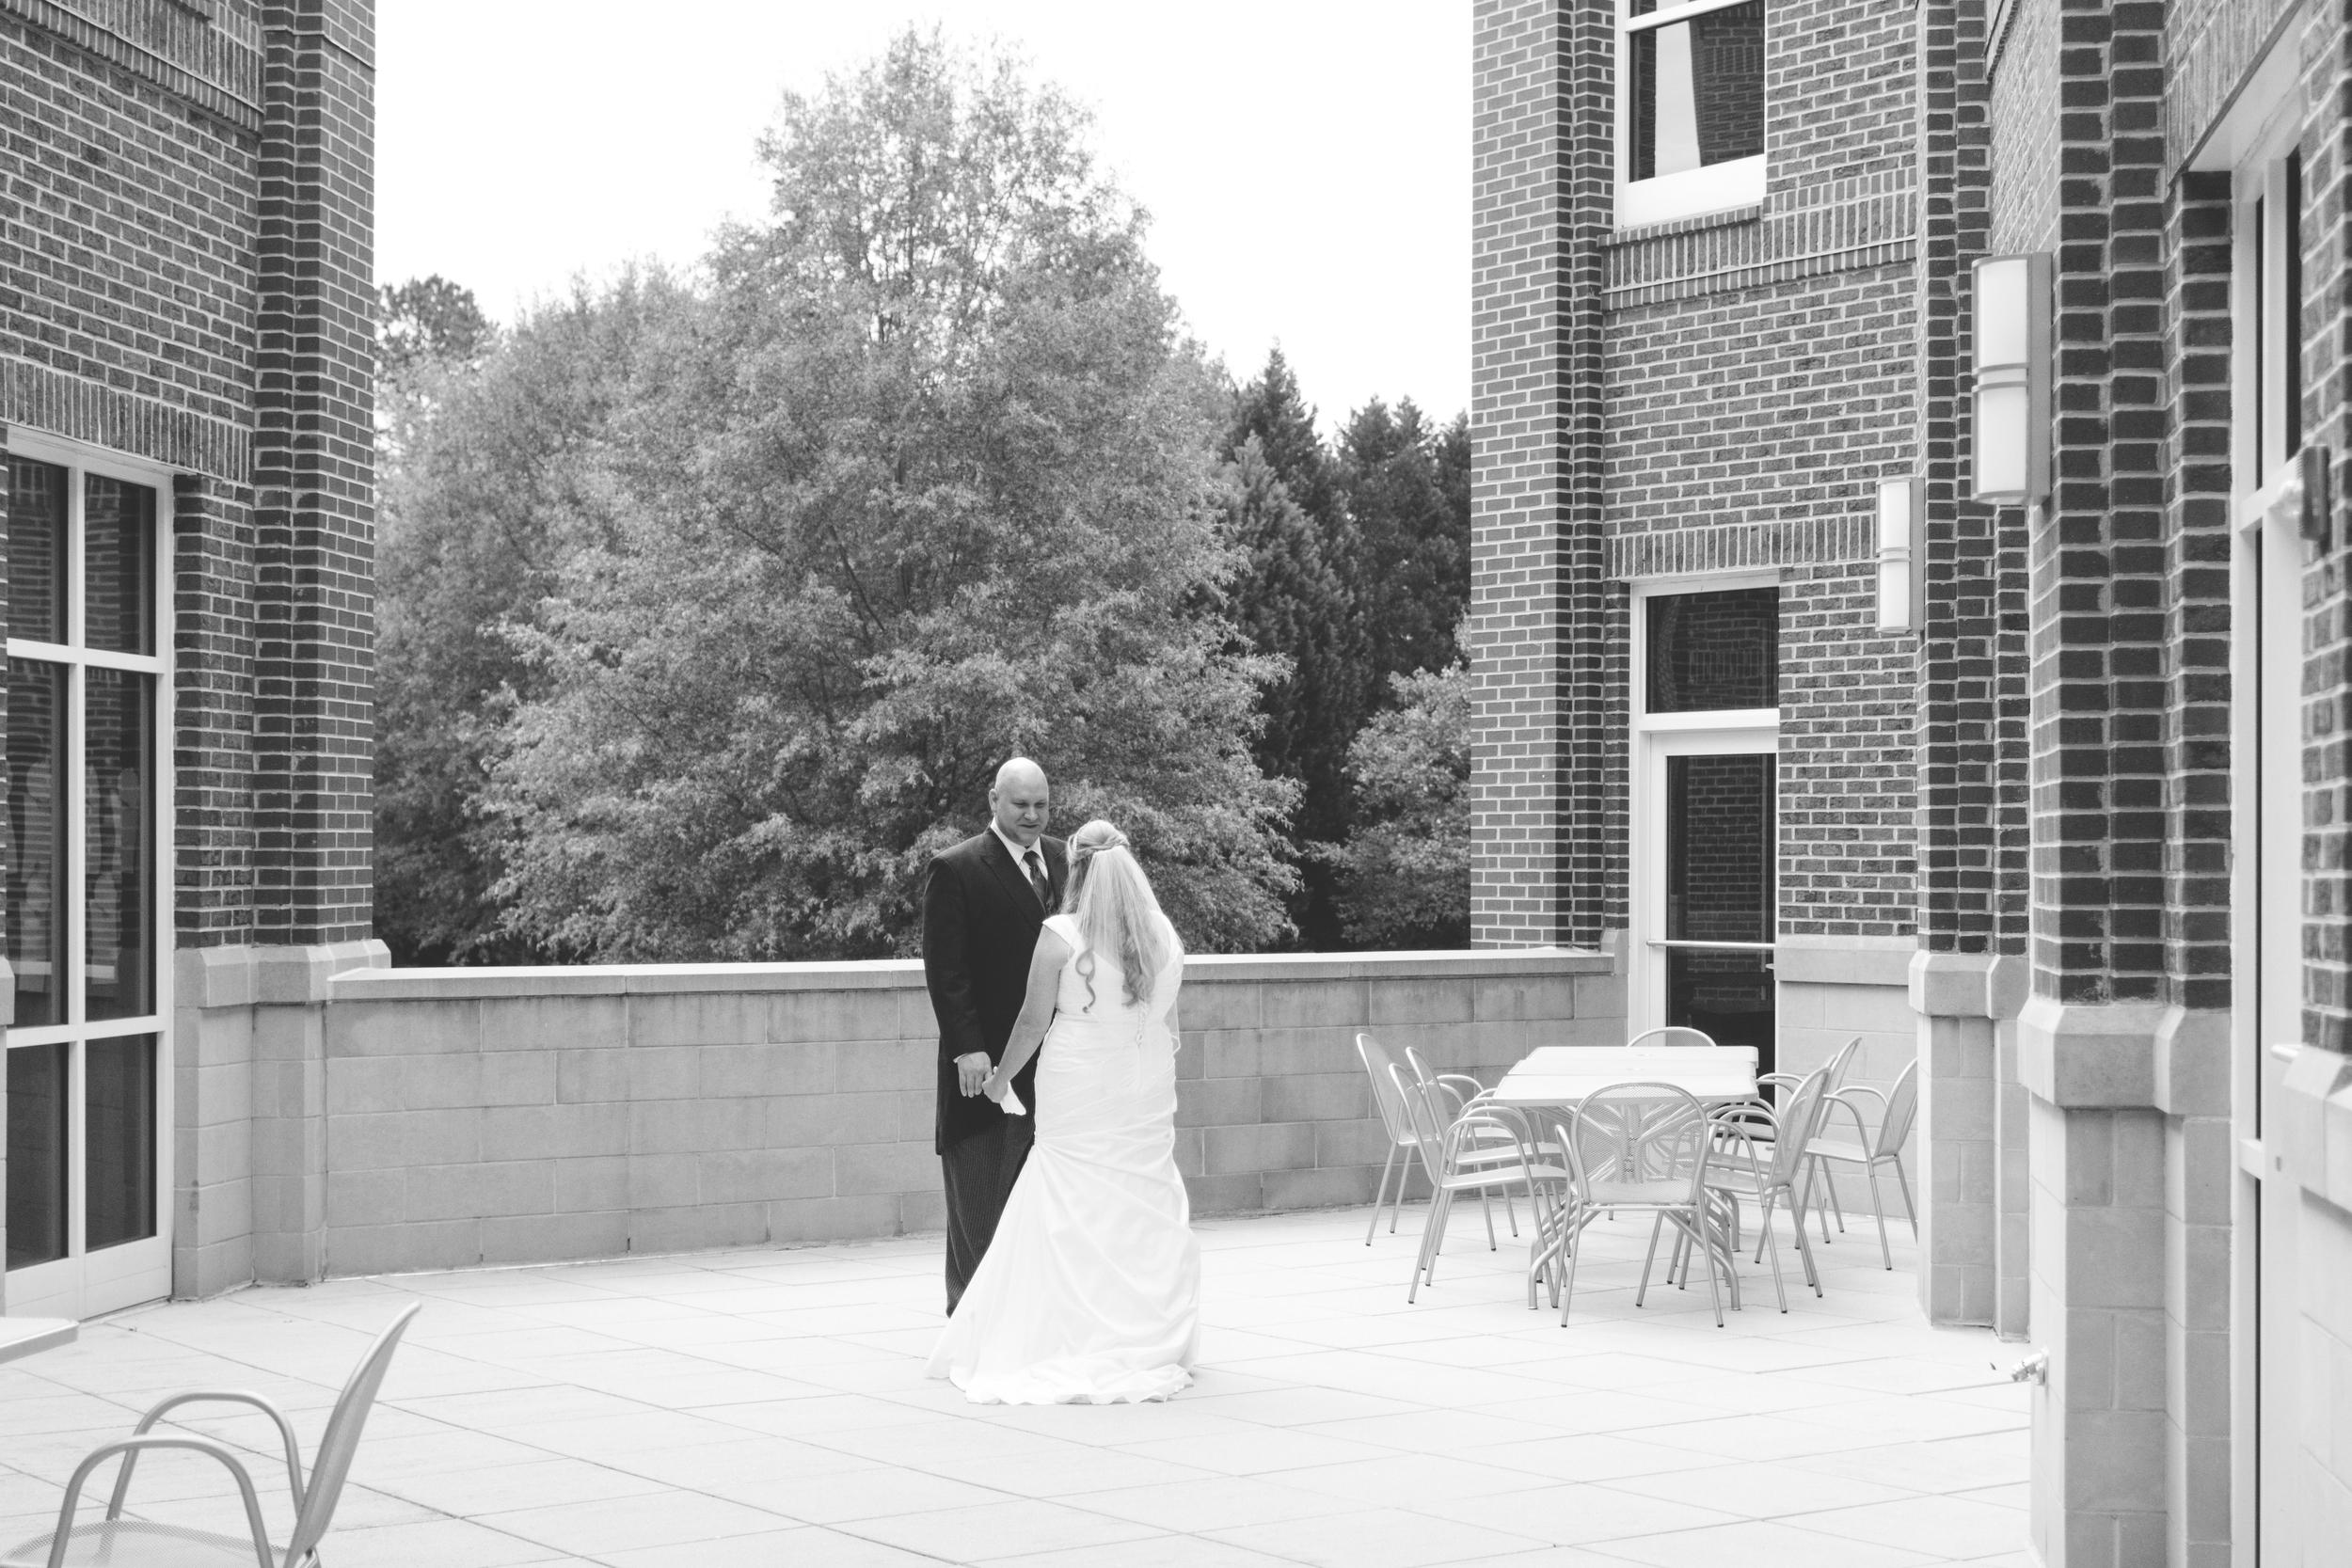 Hough_Wedding_North_Carolina_Charlotte_JonCourvillePhotography-141.jpg